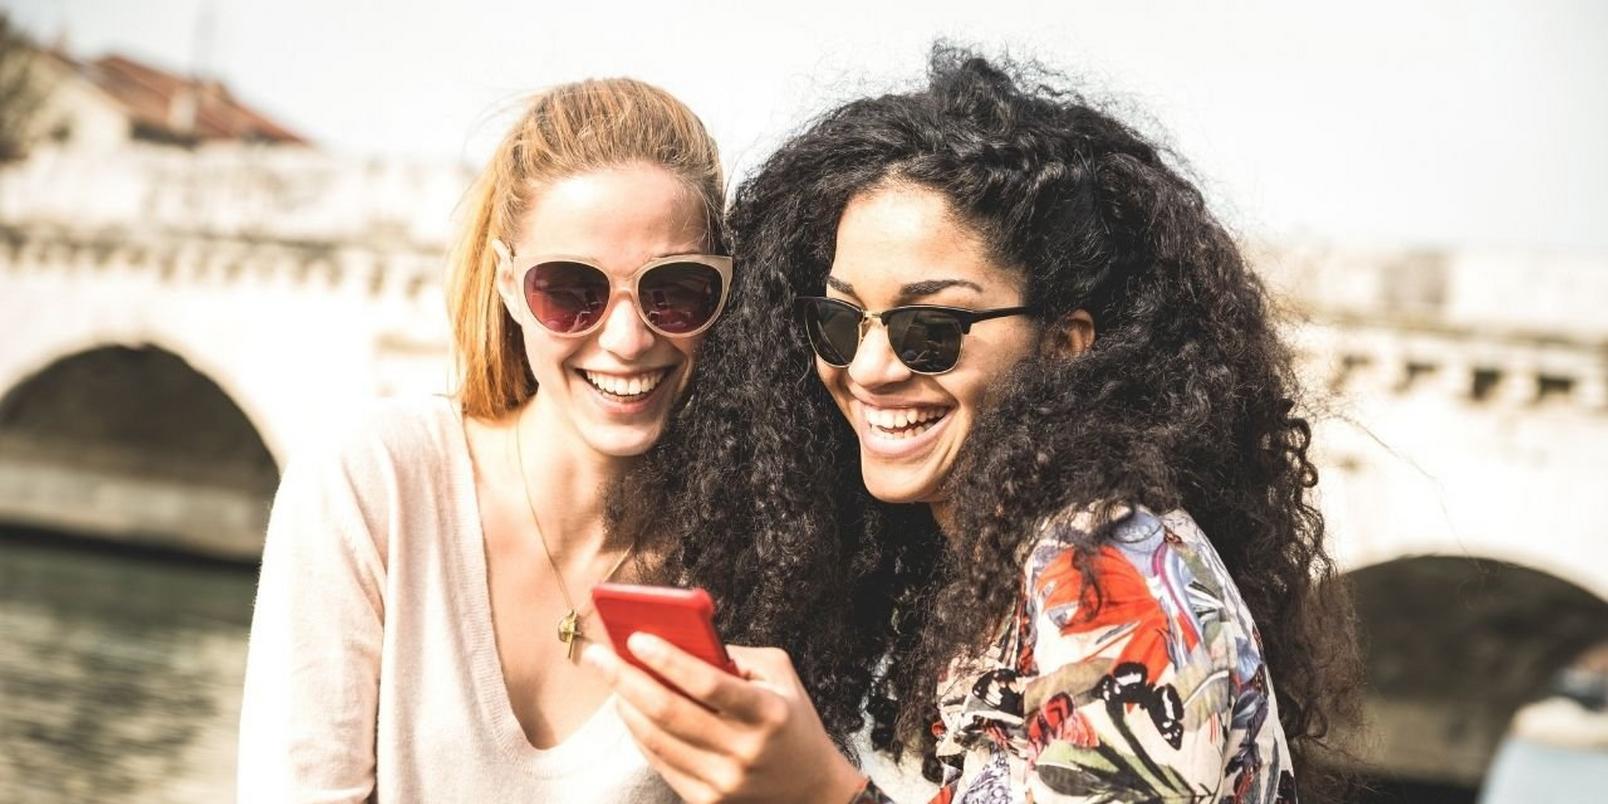 Capture-friends-phone